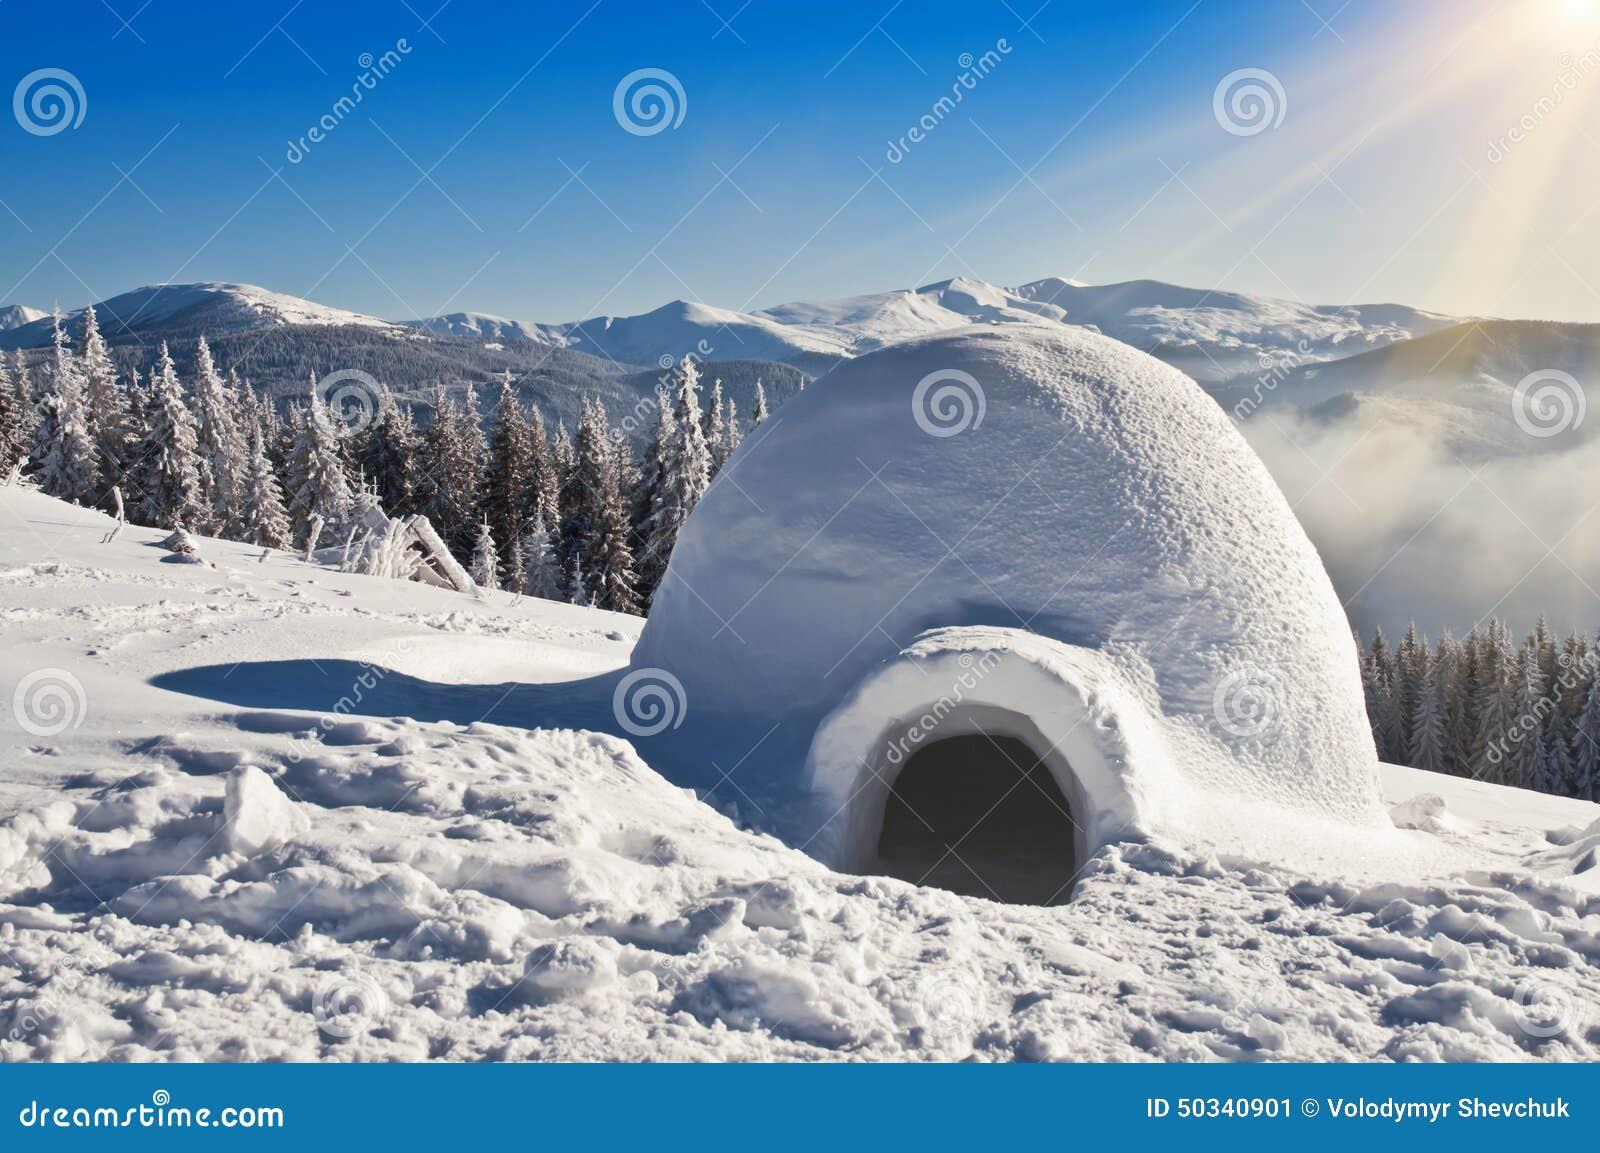 Igloo On The Snow Stock Image. Image Of Background, Igloo